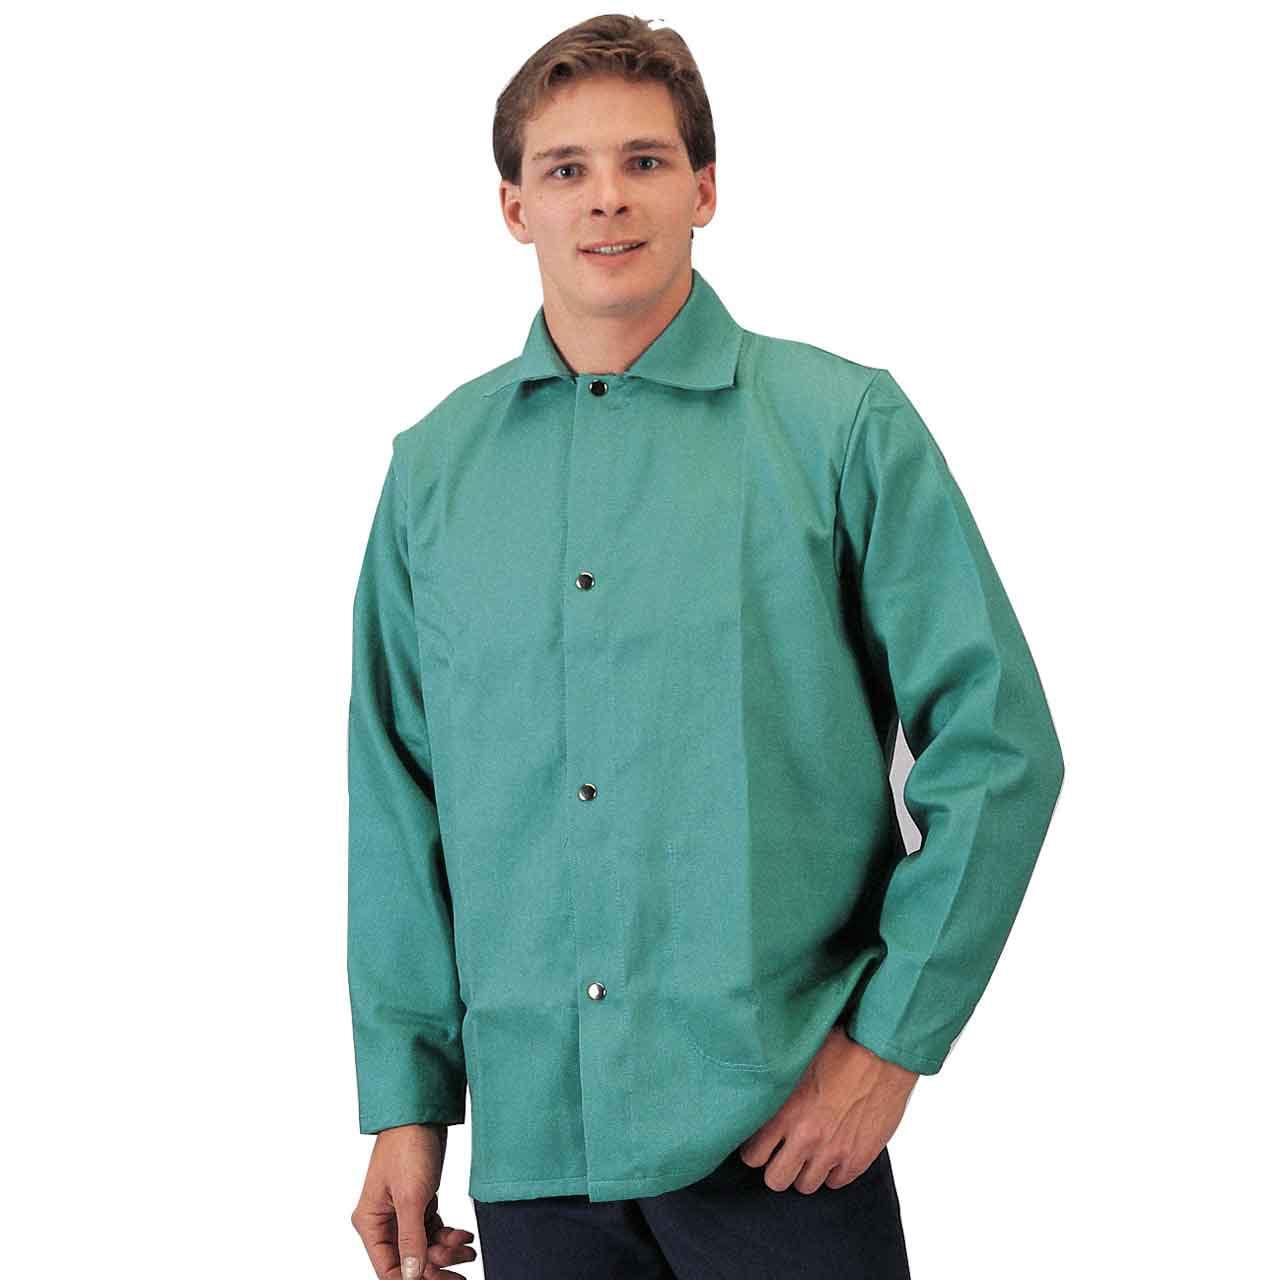 "Tillman 6230 30"" 9 oz. Green Flame Resistant Cotton Welding Jacket, X-Large"